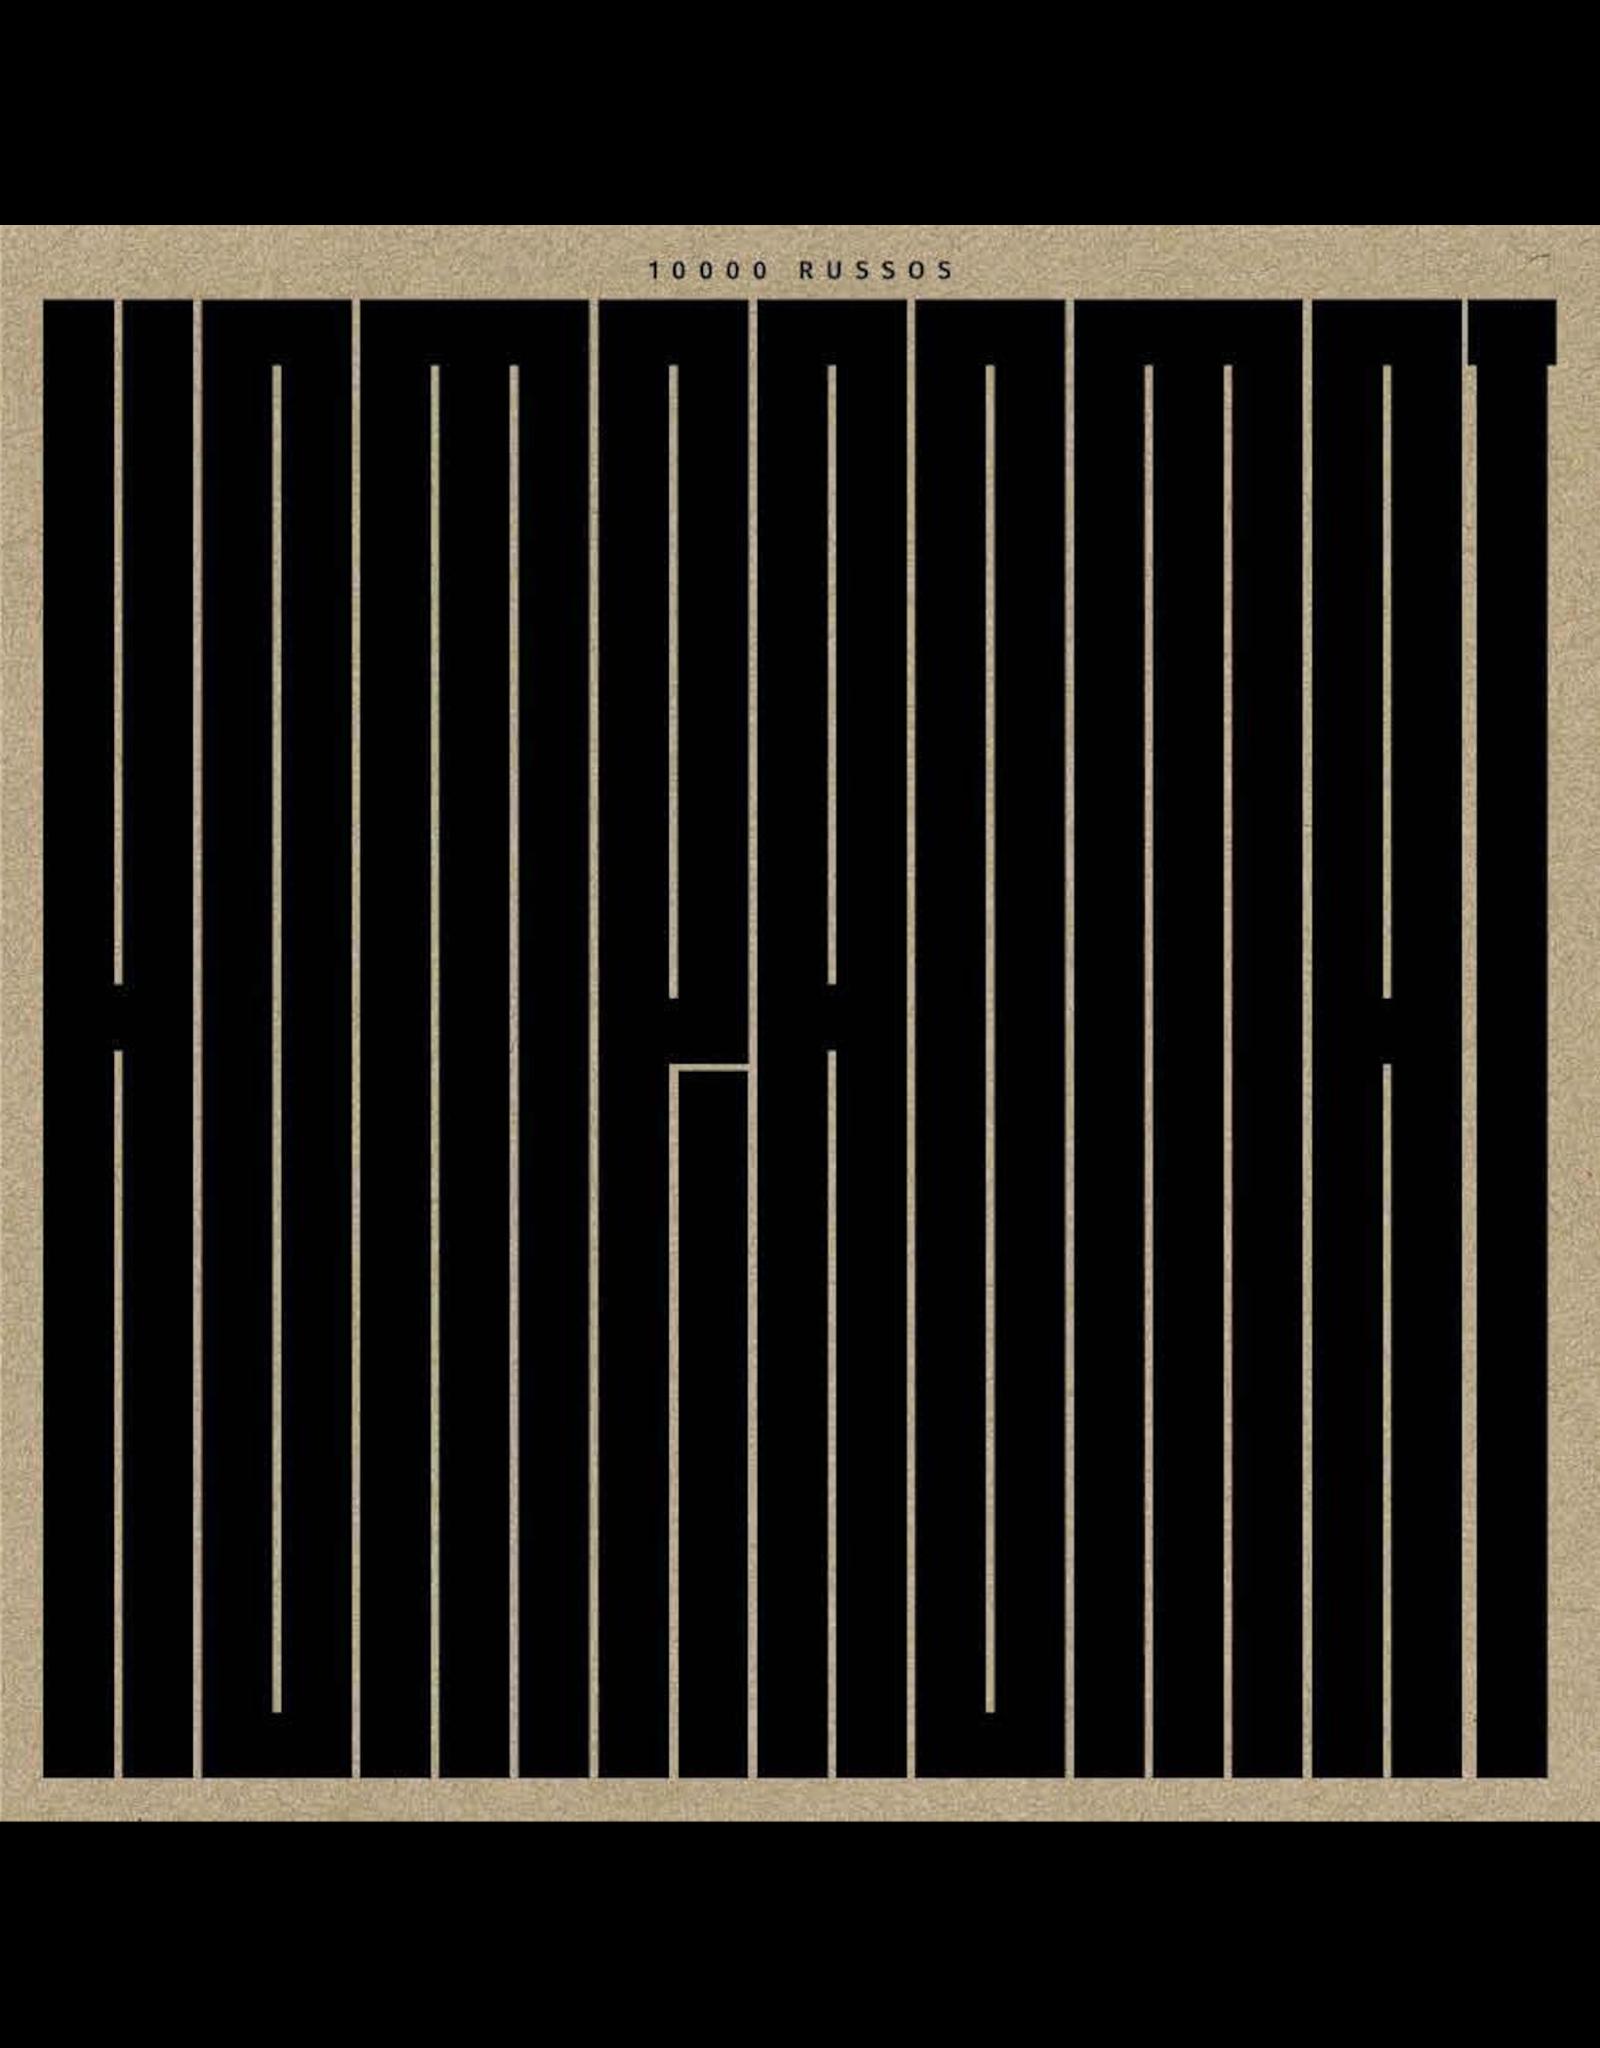 Fuzz Club 10000 Russos: Kompromat LP